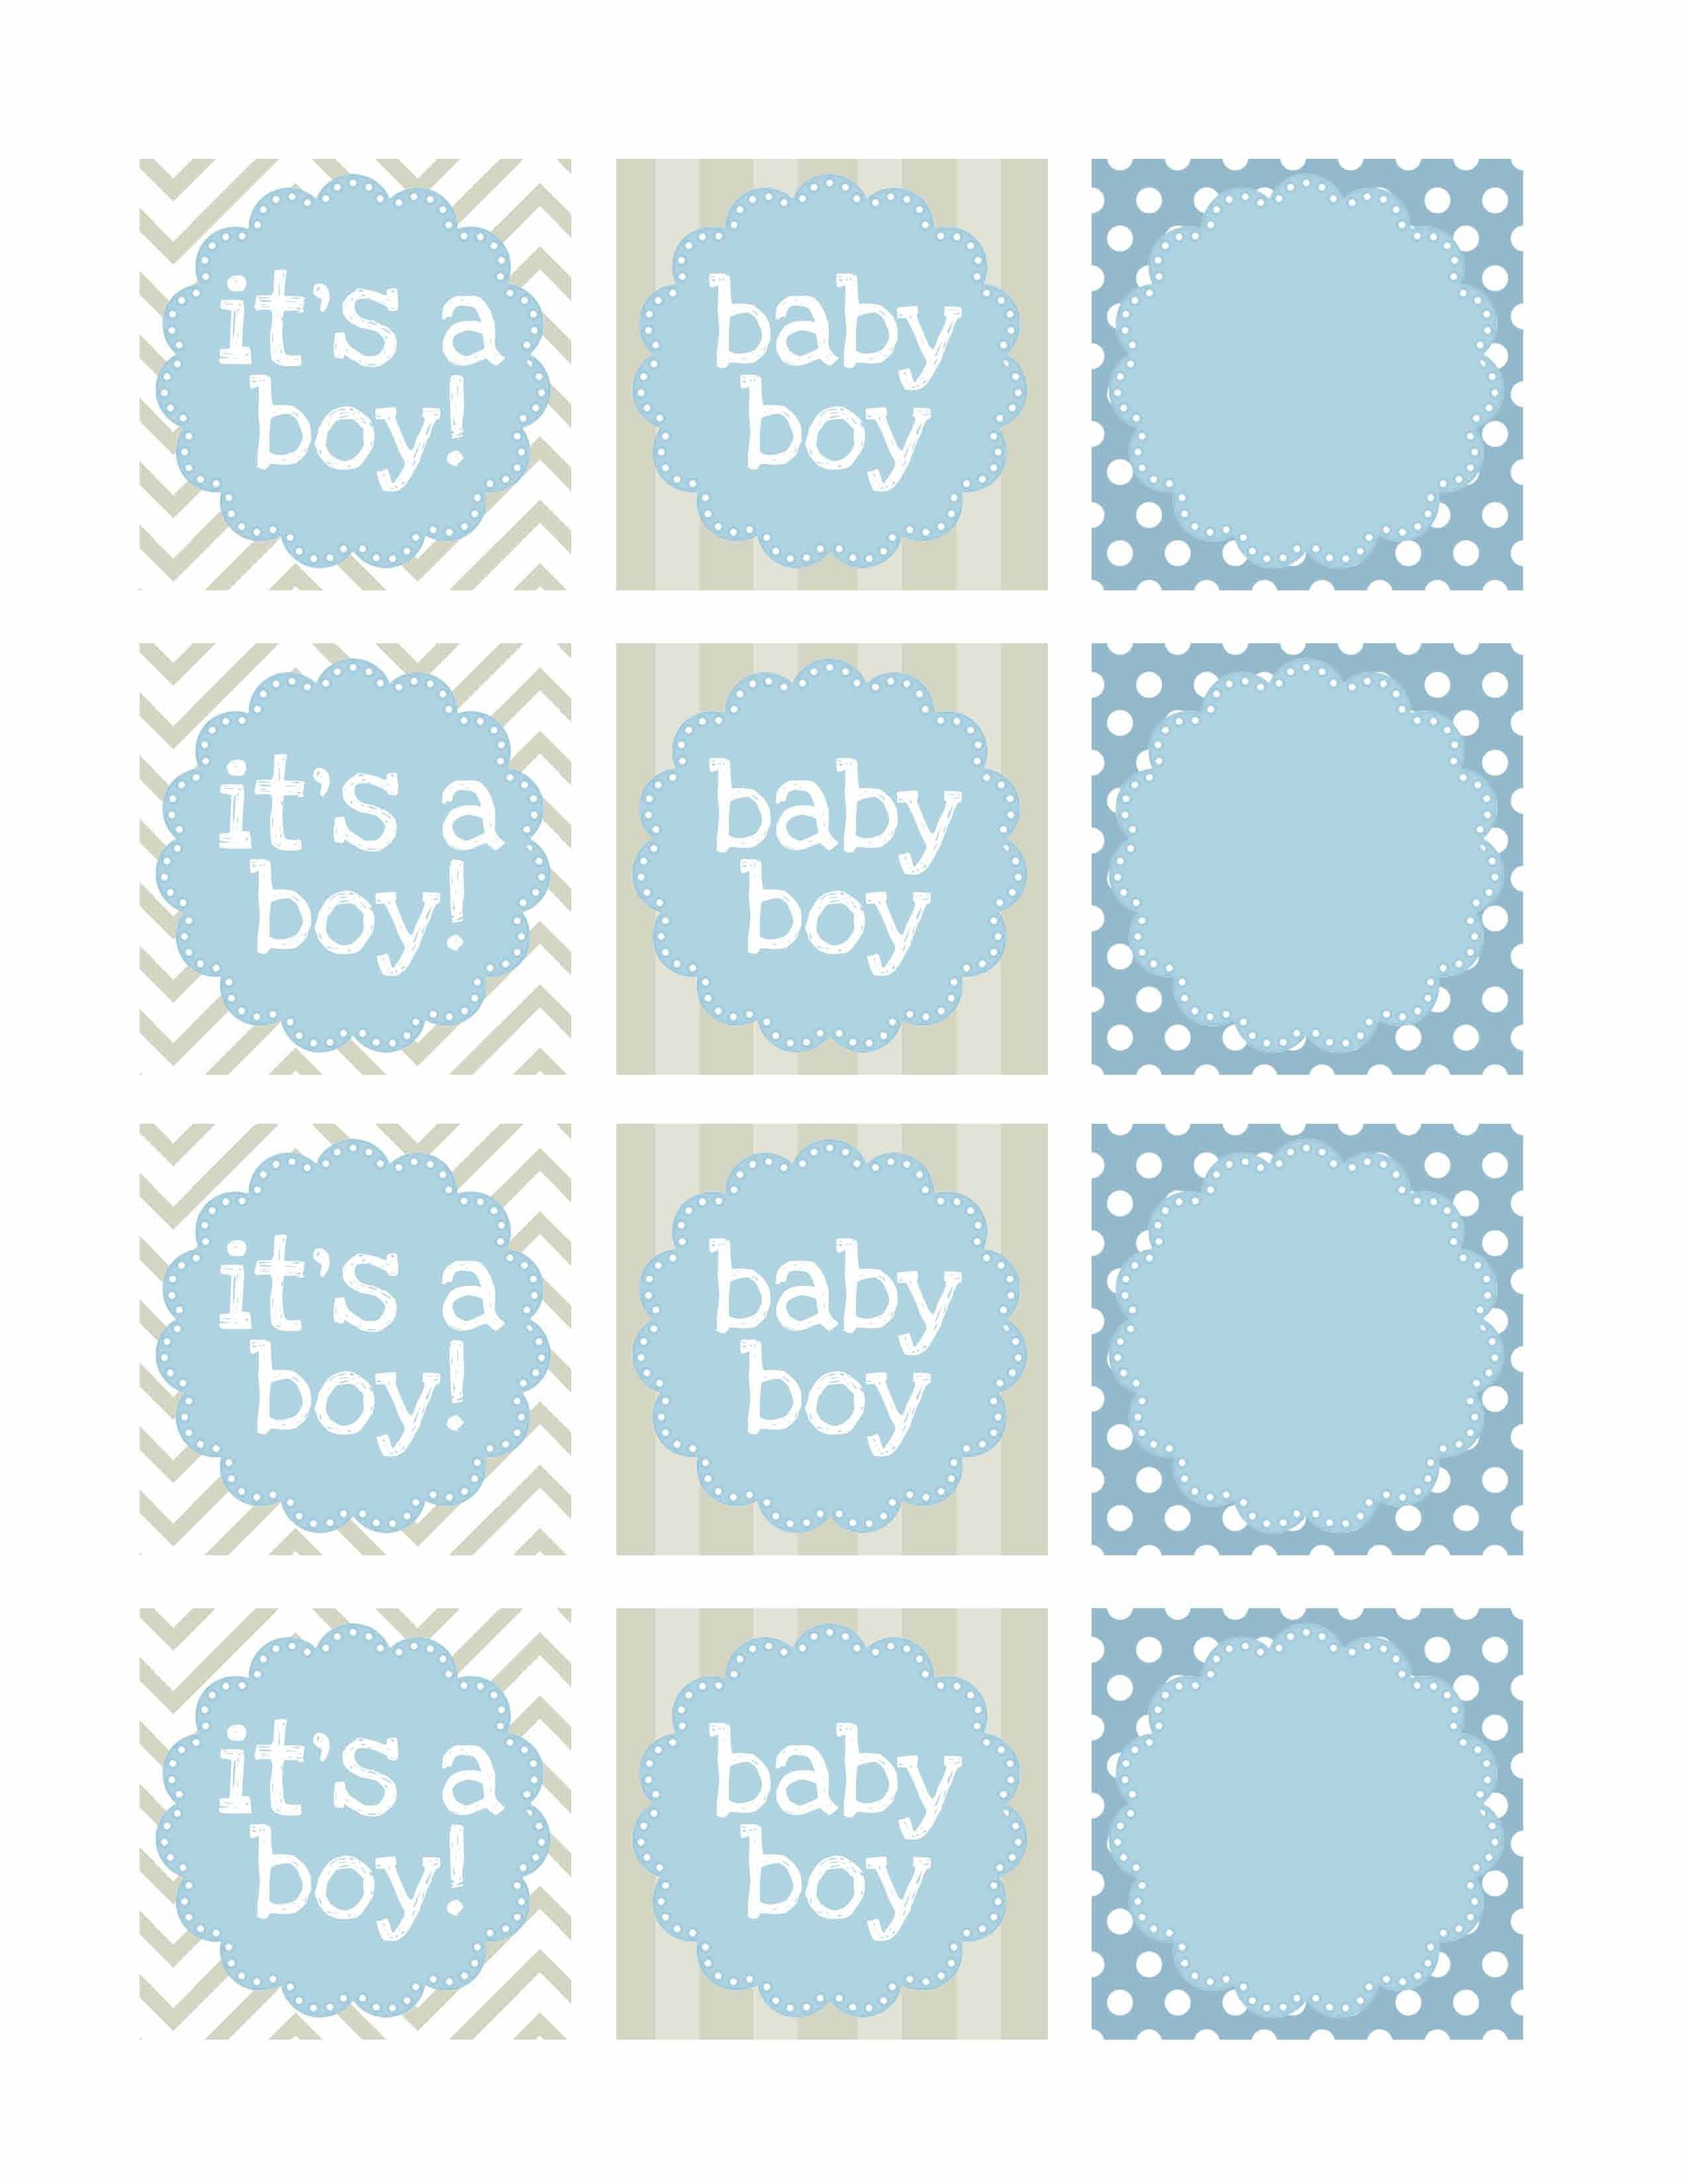 Boy Baby Shower Free Printables | Baby Shower | Baby Shower Labels - Free Printable Baby Boy Cards